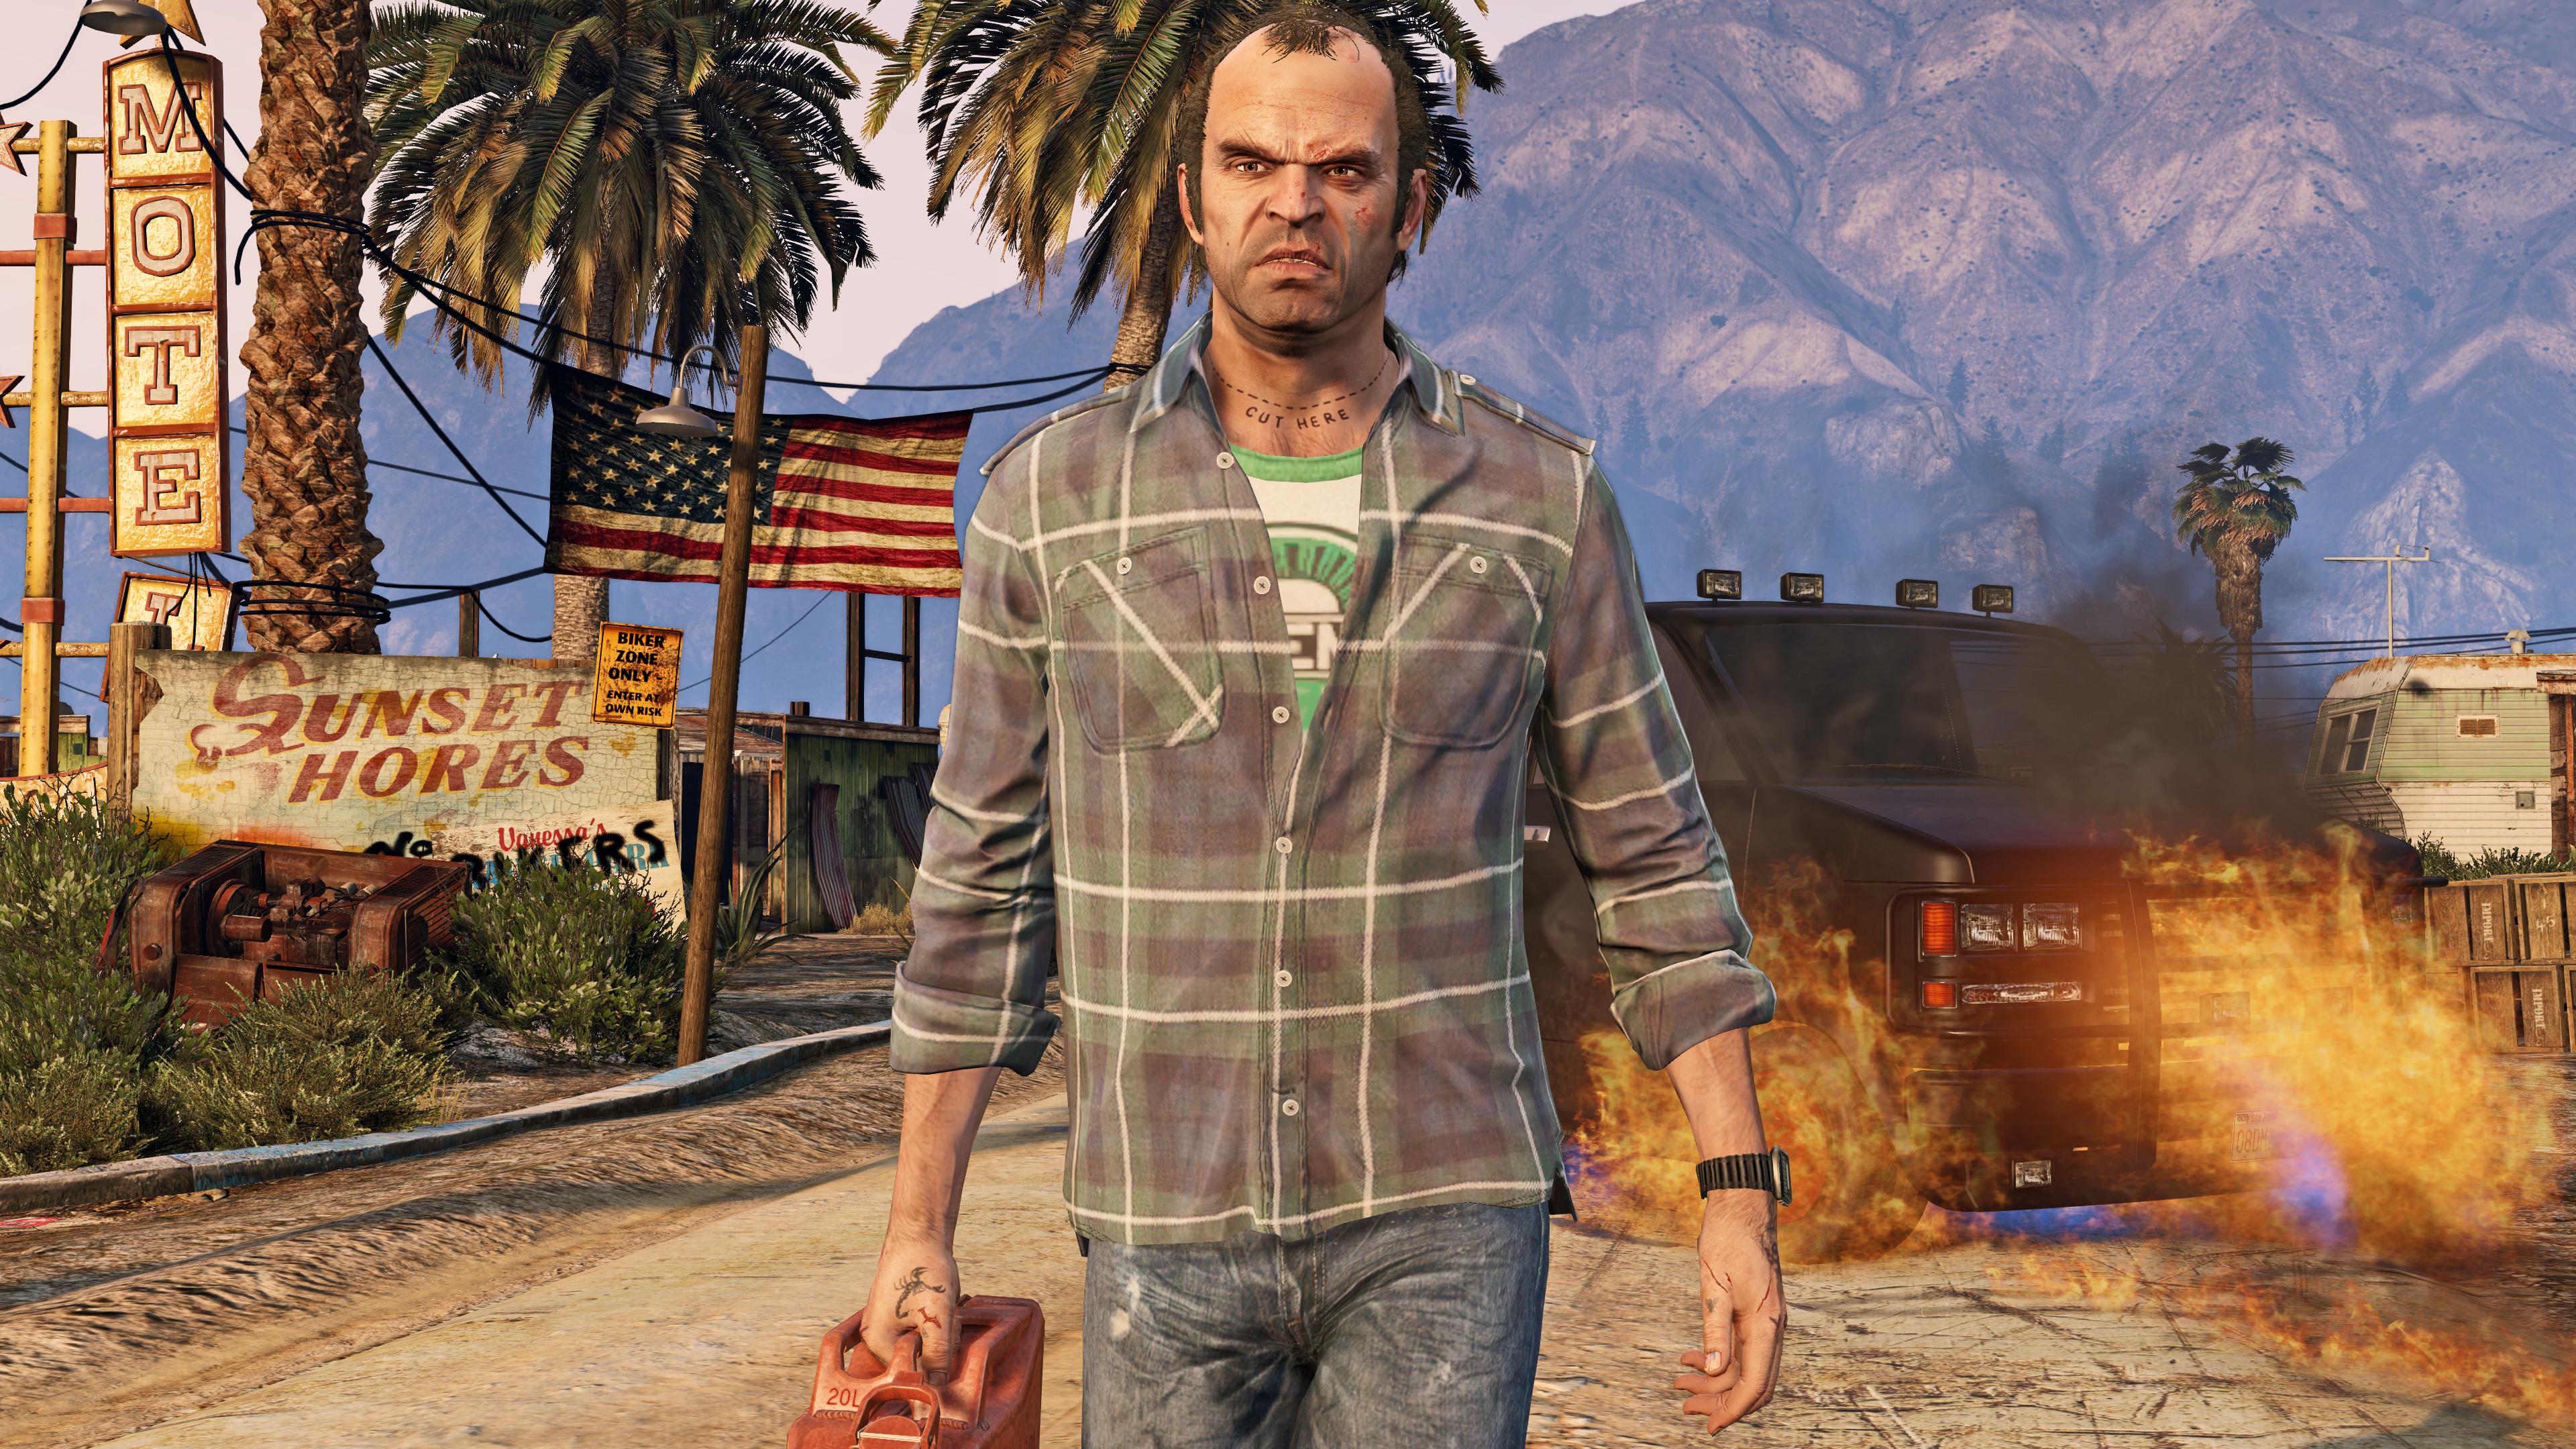 GTA V Image du jeu sur PC 4K Trevor